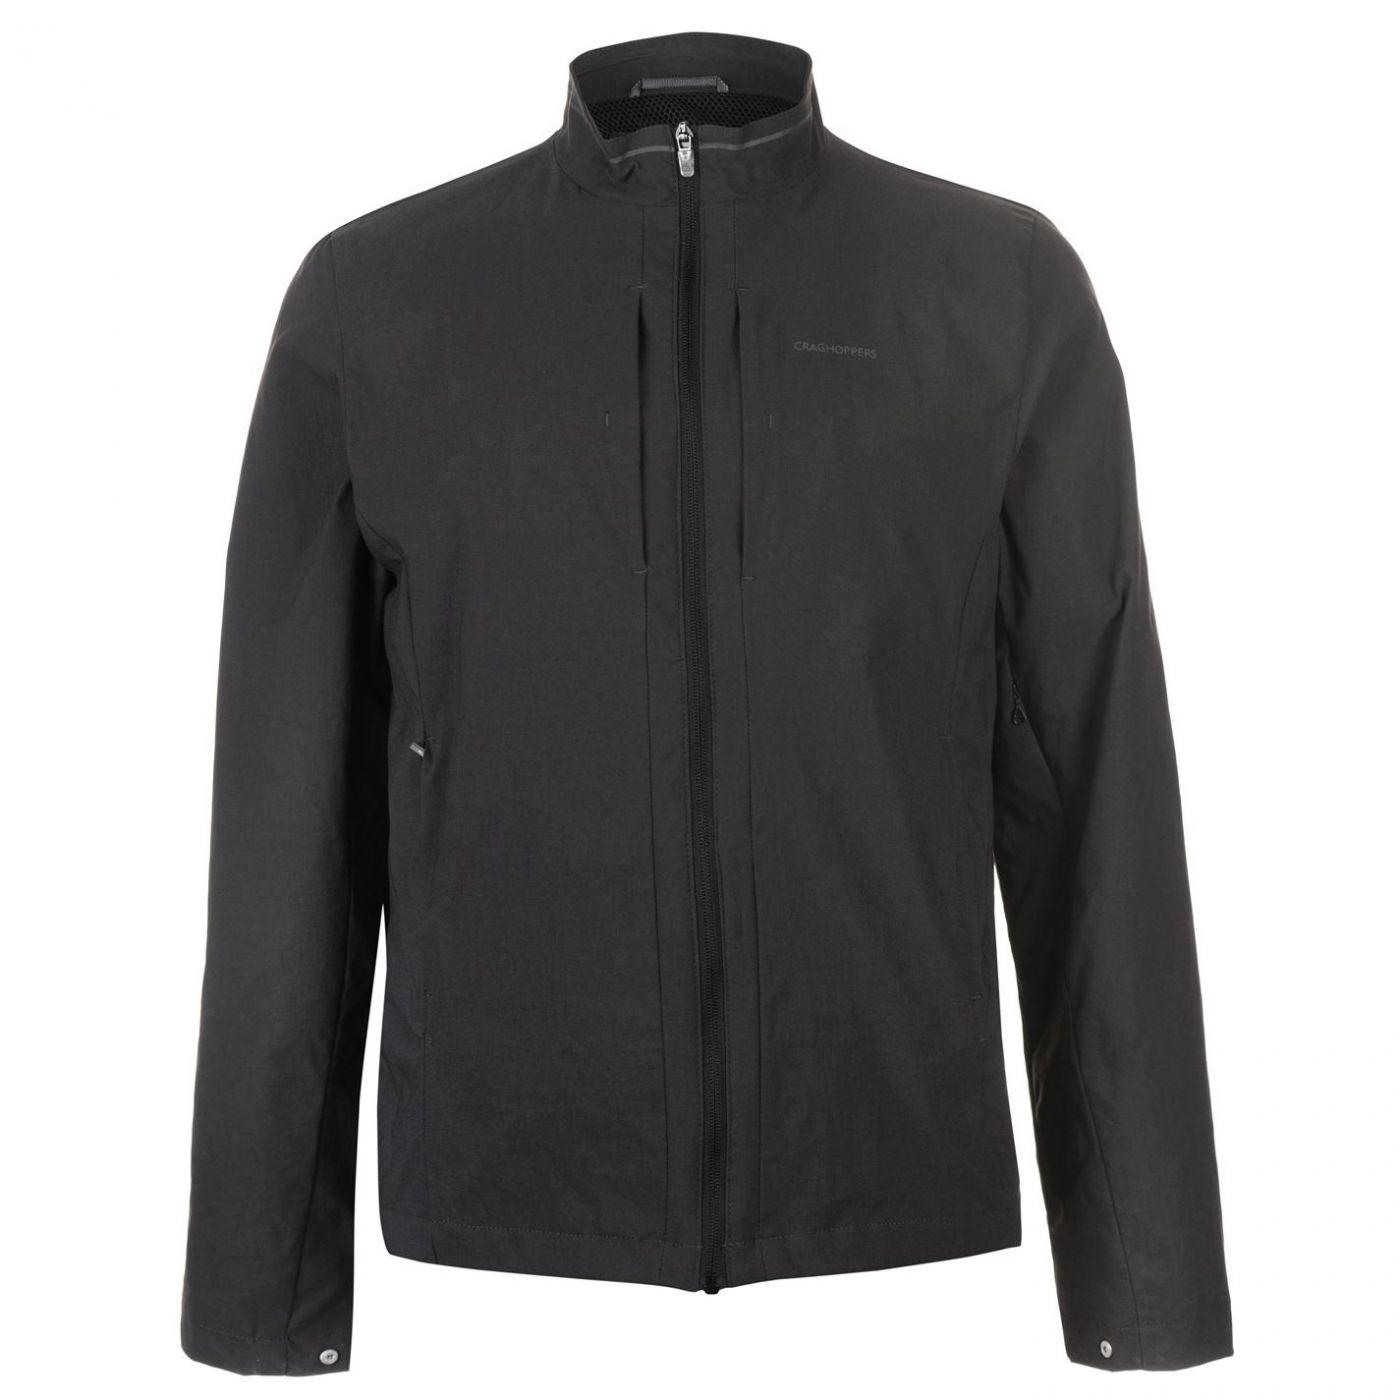 Craghoppers NosiLife Daven Jacket Mens